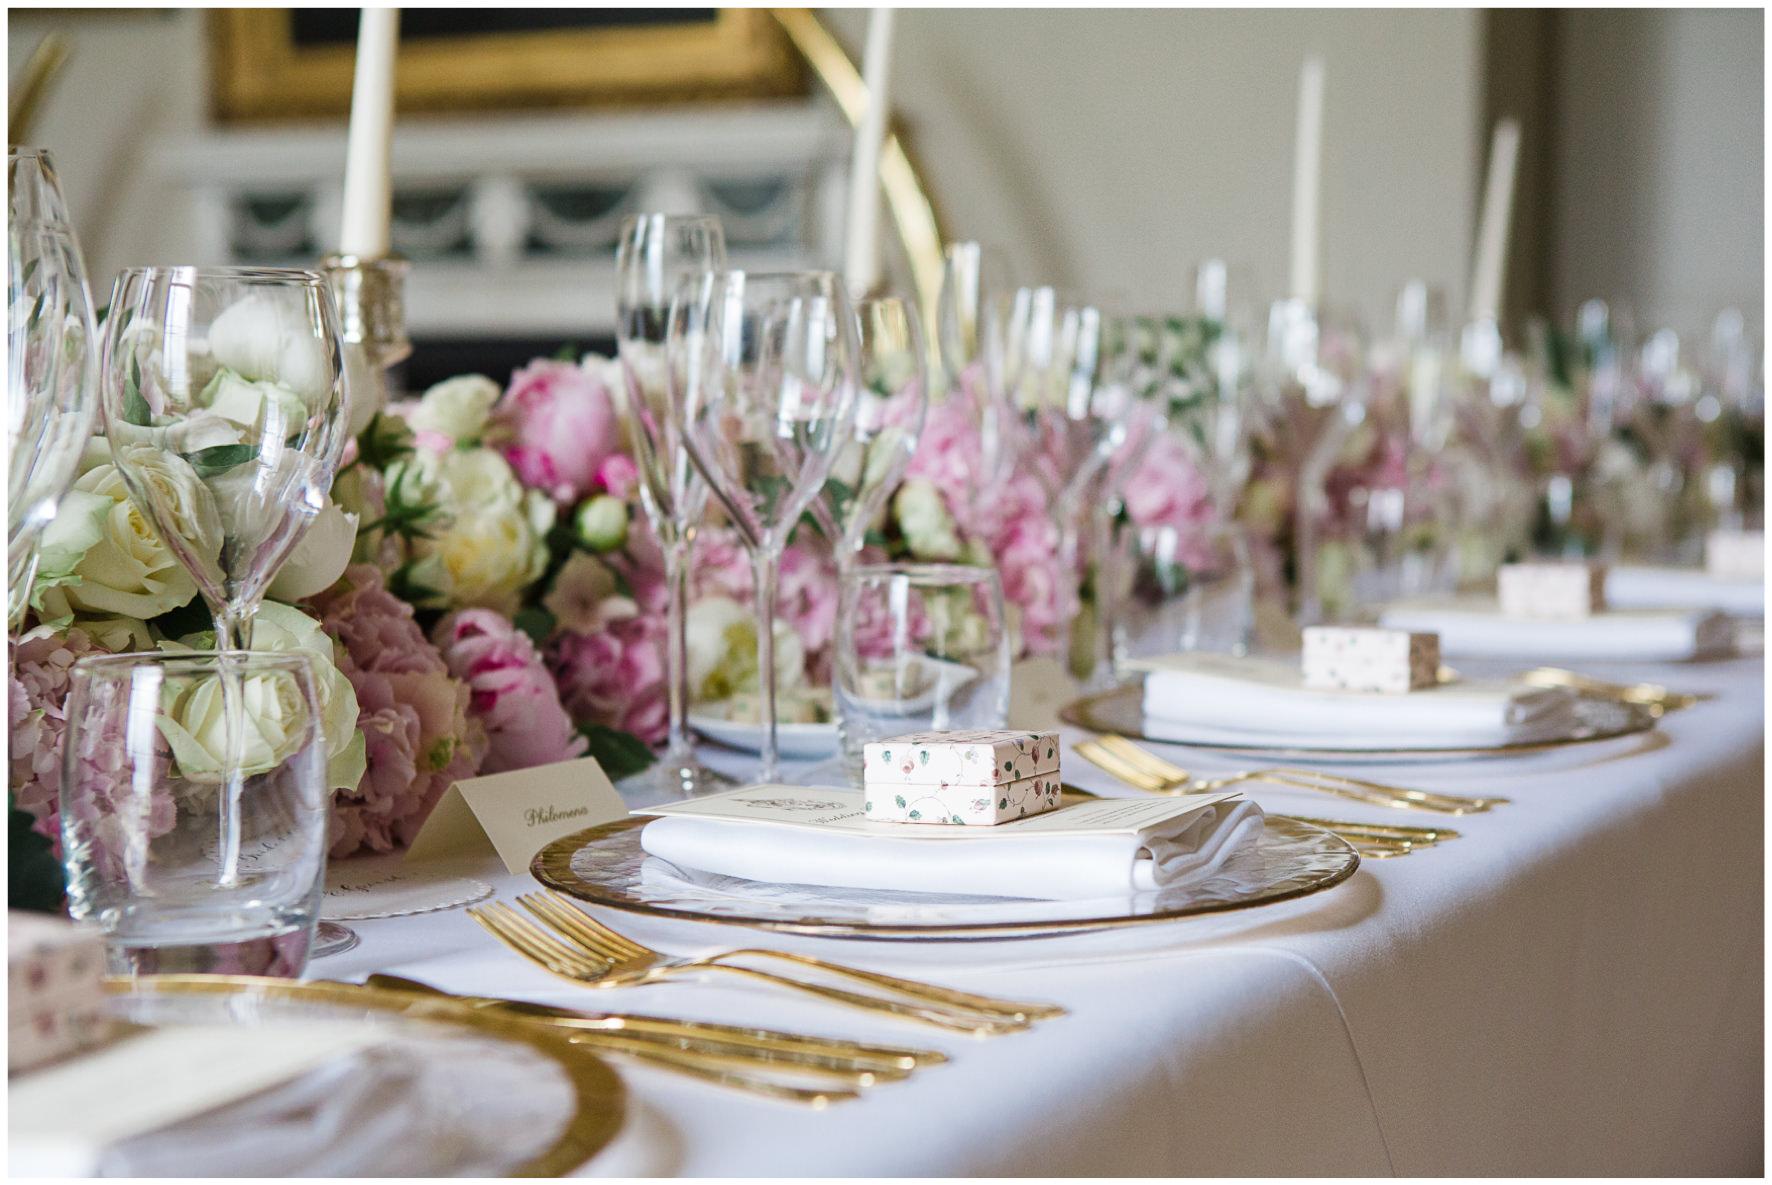 Lucy Davenport Photography, Aynhoe Park, Oxfordshire, wedding venue, Rock My Wedding, wedding breakfast, laduree favours